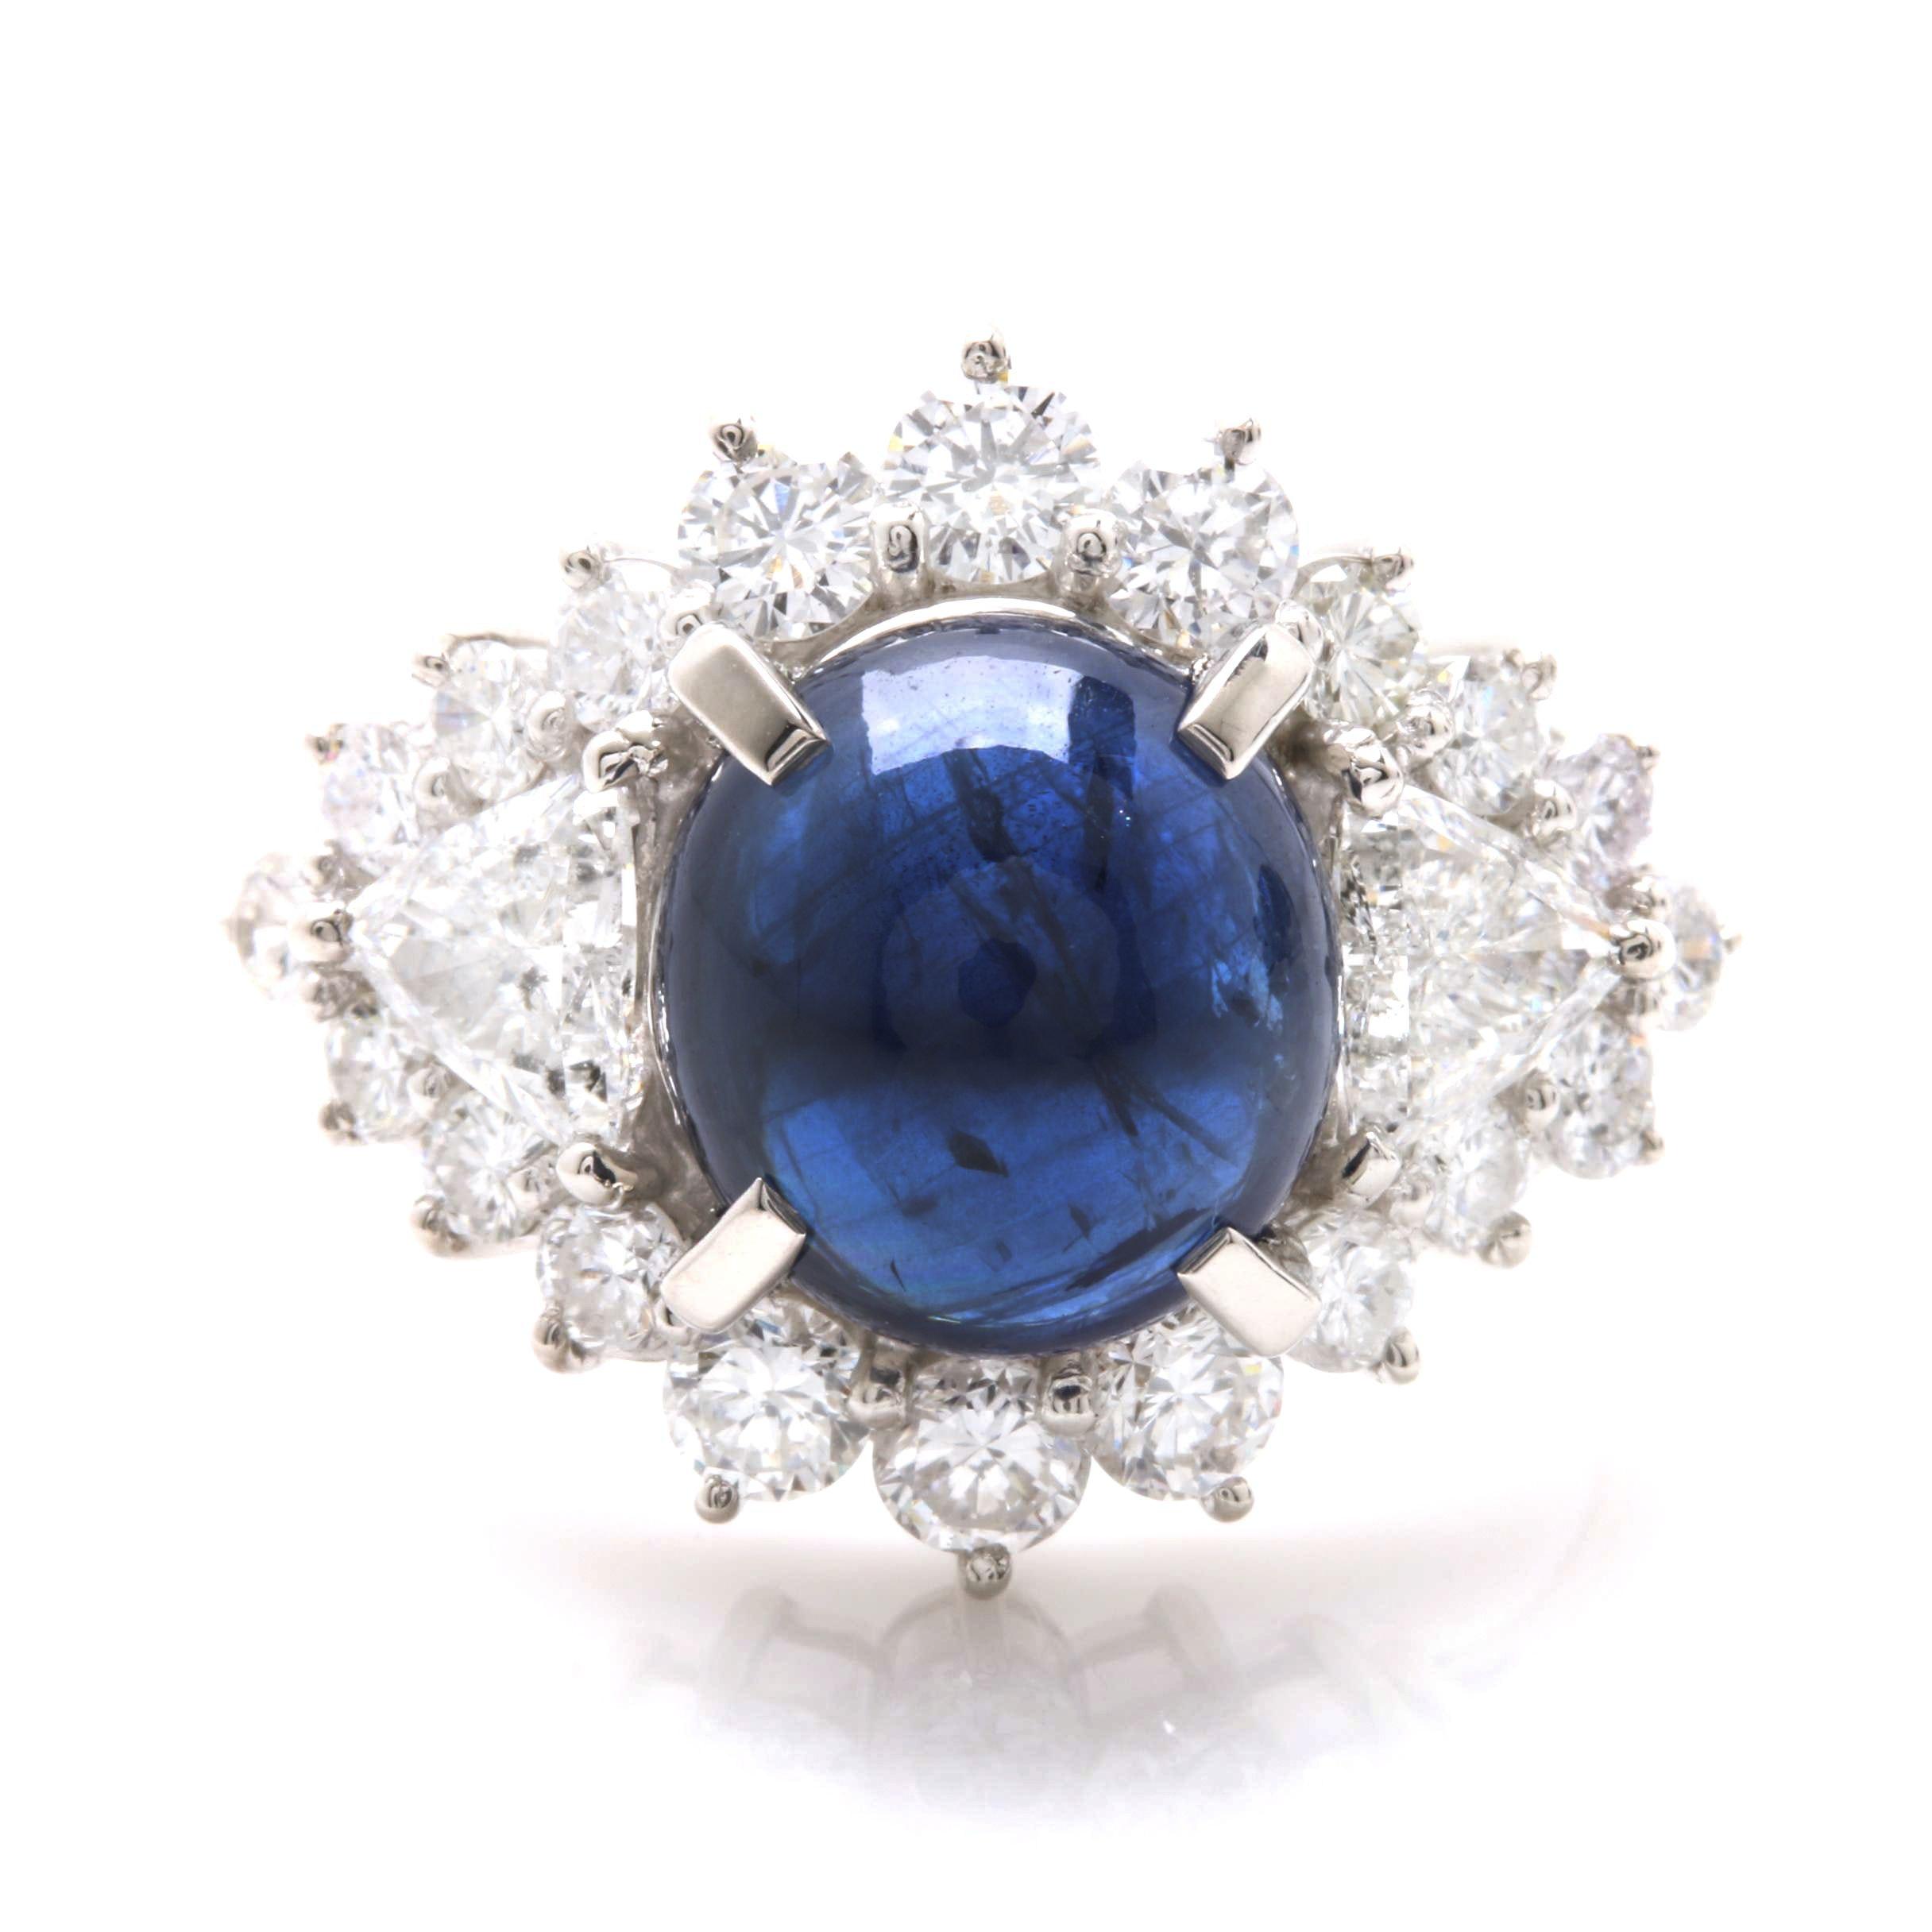 Platinum 3.69 CT Unheated Blue Sapphire and 1.23 CTW Diamond Ring